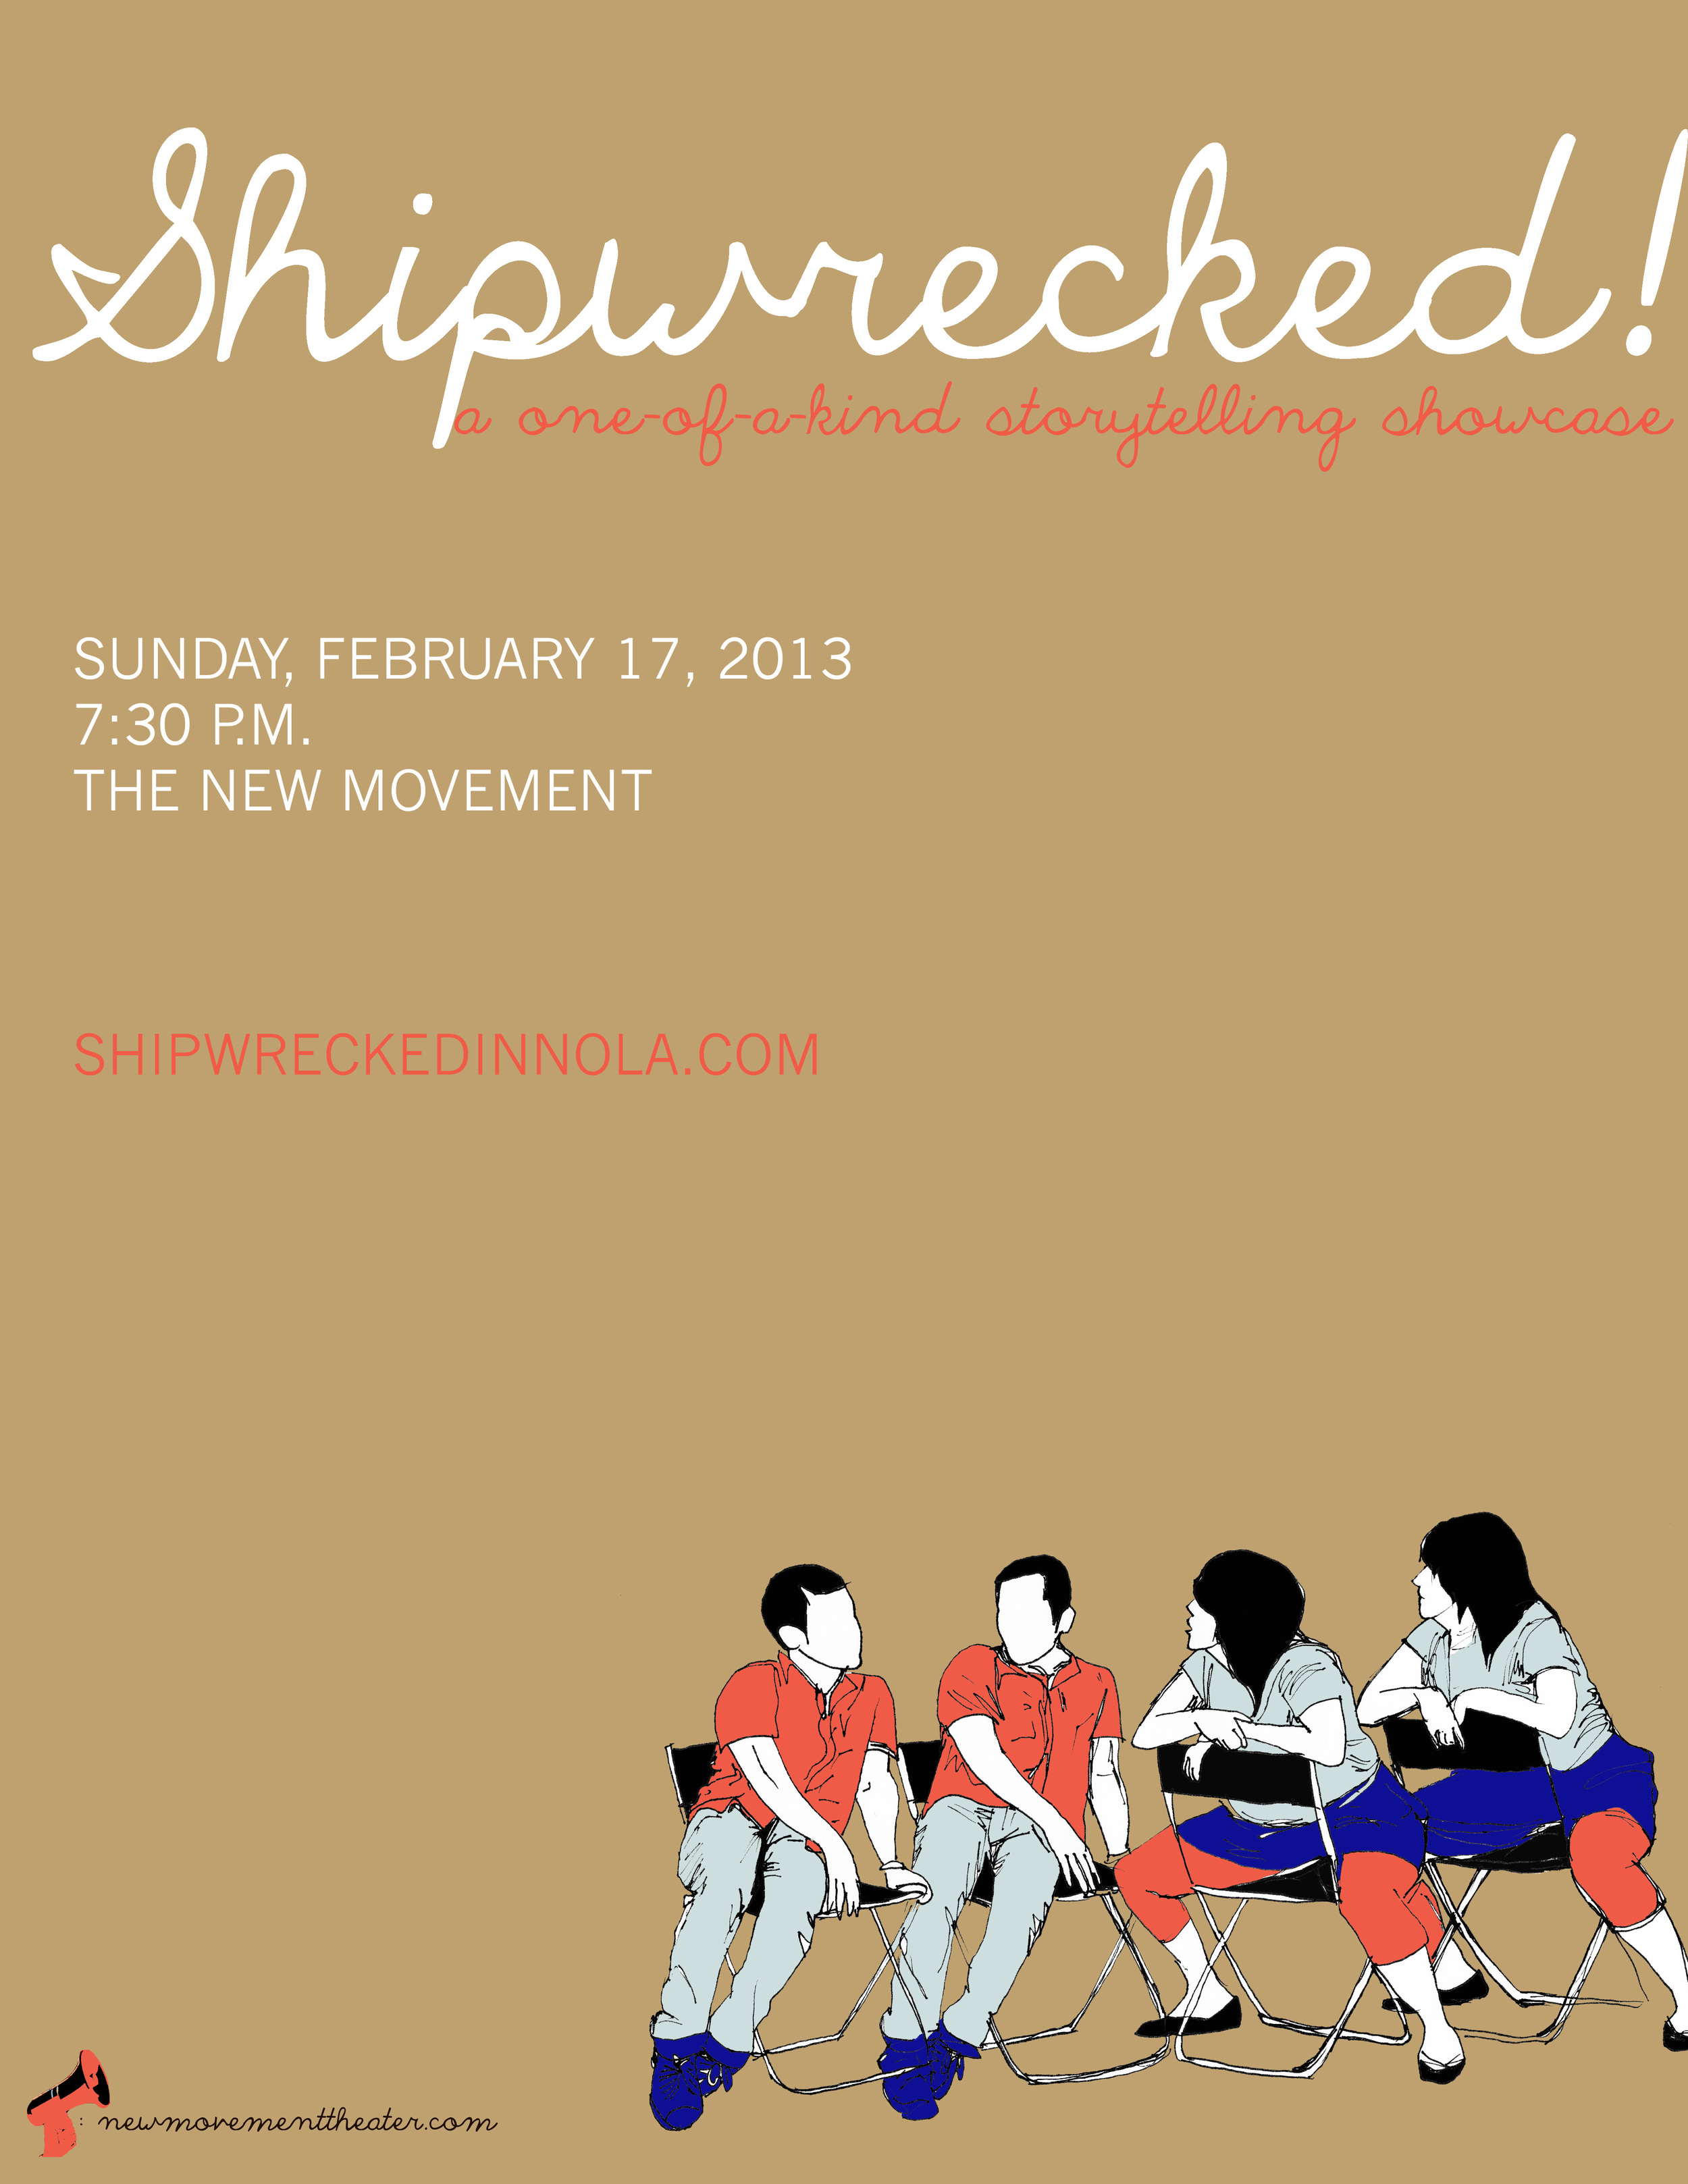 shipwrecked8.jpg